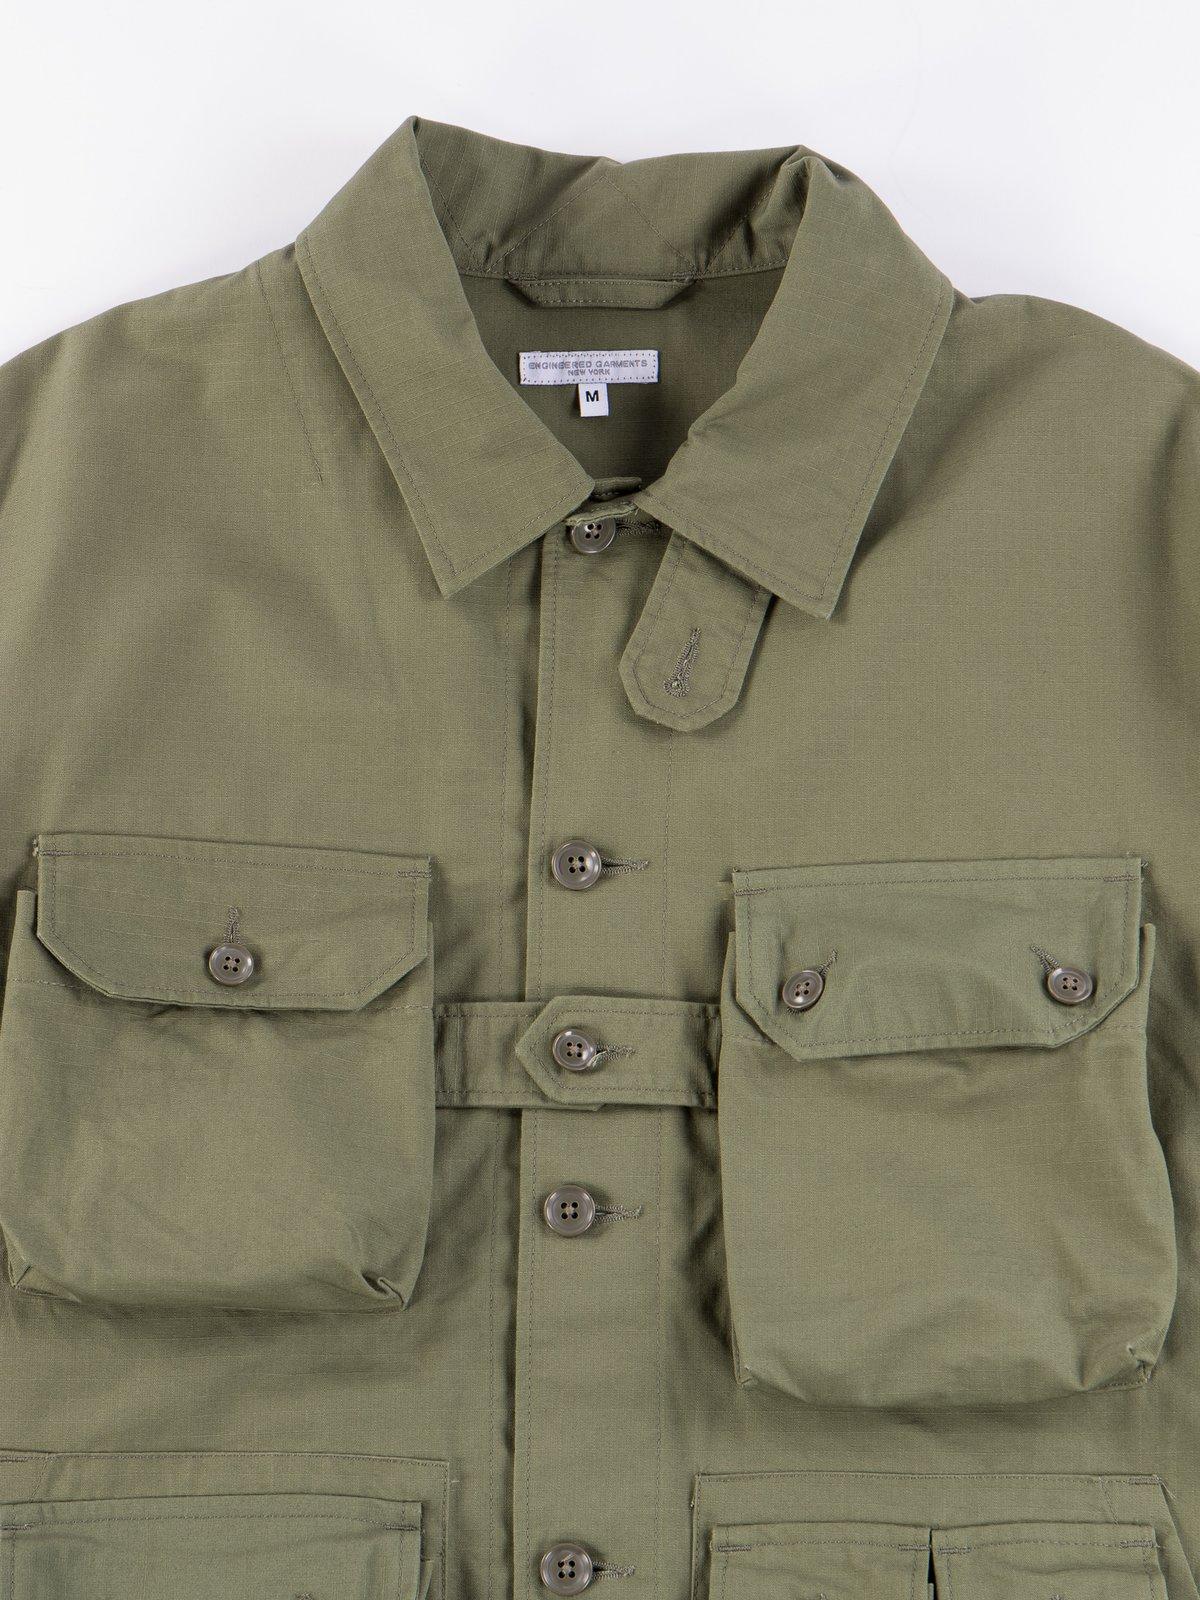 Olive Cotton Ripstop Explorer Shirt Jacket - Image 4